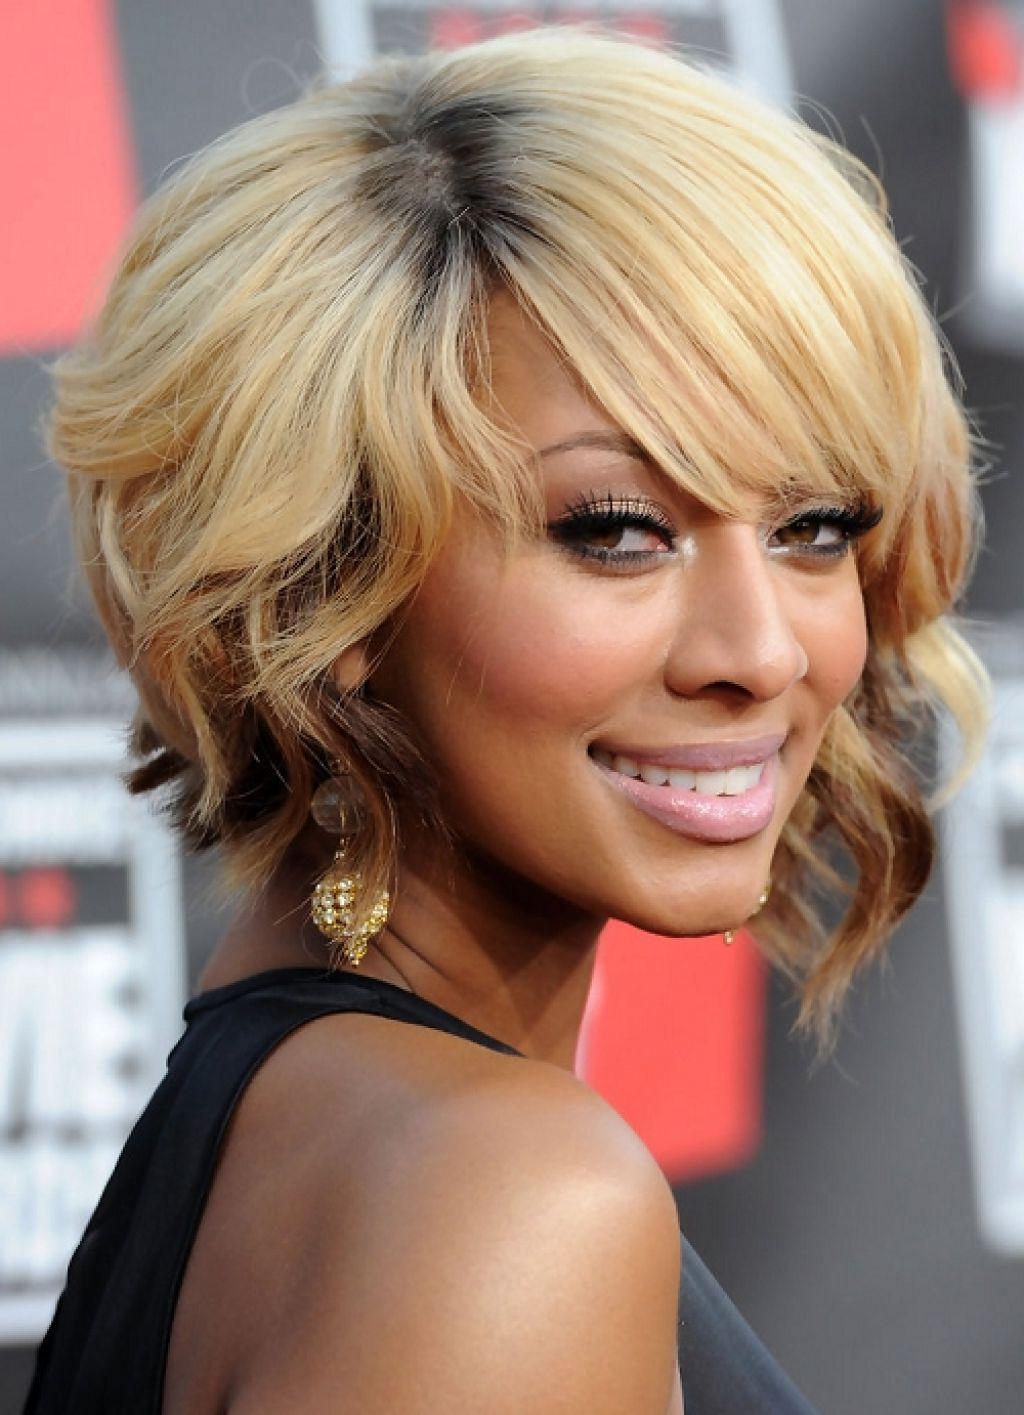 Trendy Medium Hairstyles For African American Women With 5 Hottest Medium Blonde Hairstyles For African American Women (View 16 of 20)